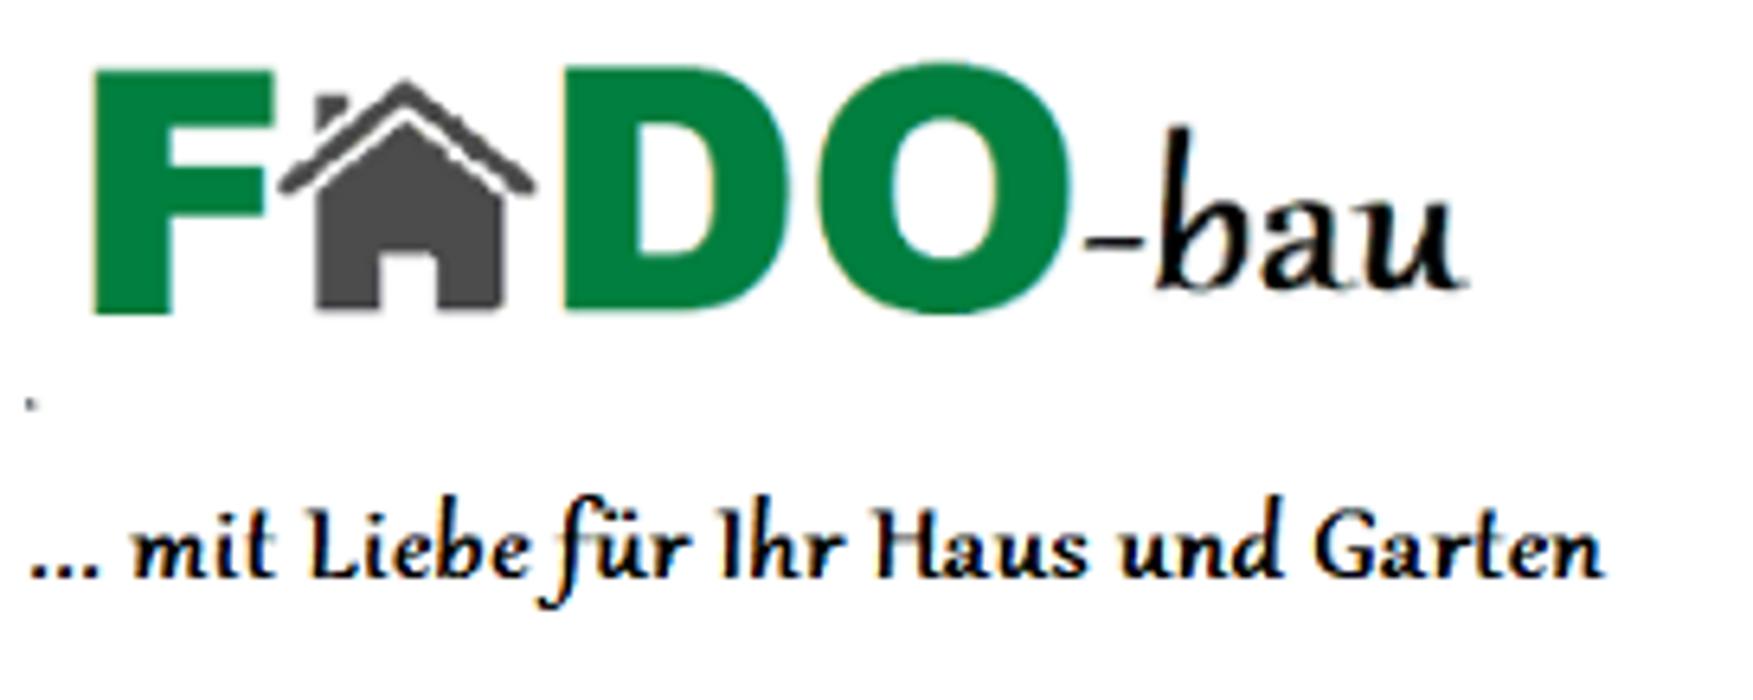 Bild zu Fado-bau in Hennigsdorf